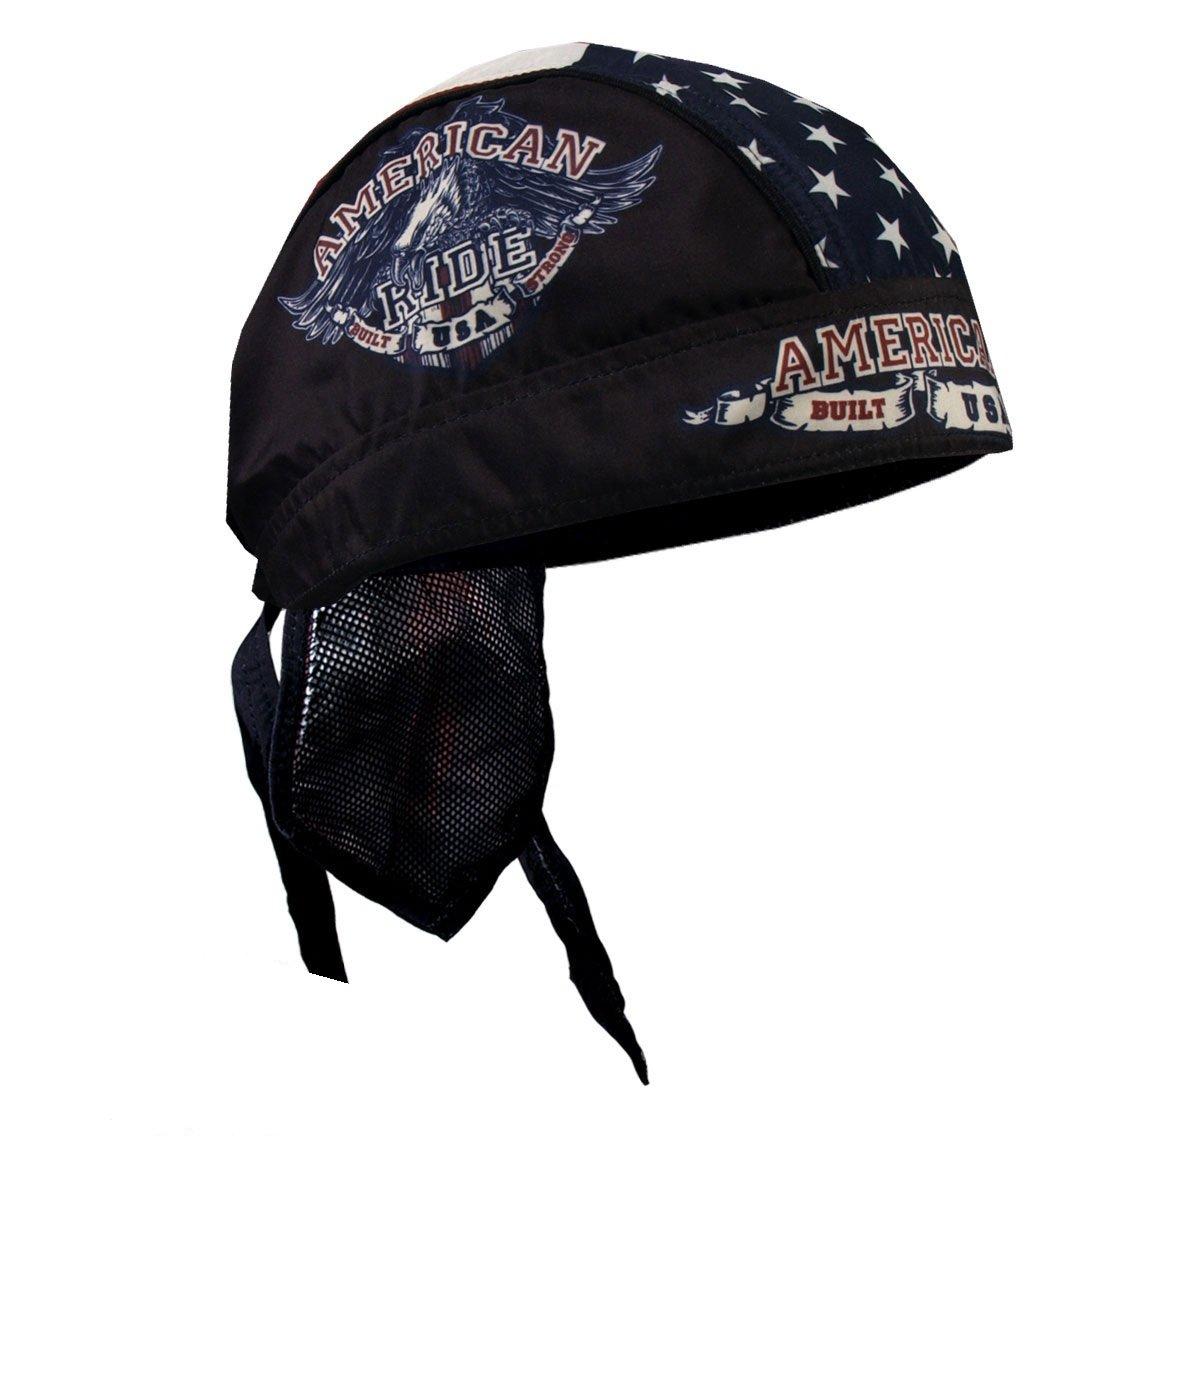 Zandana pa/ñuelo de Cabeza US American Ride /águila